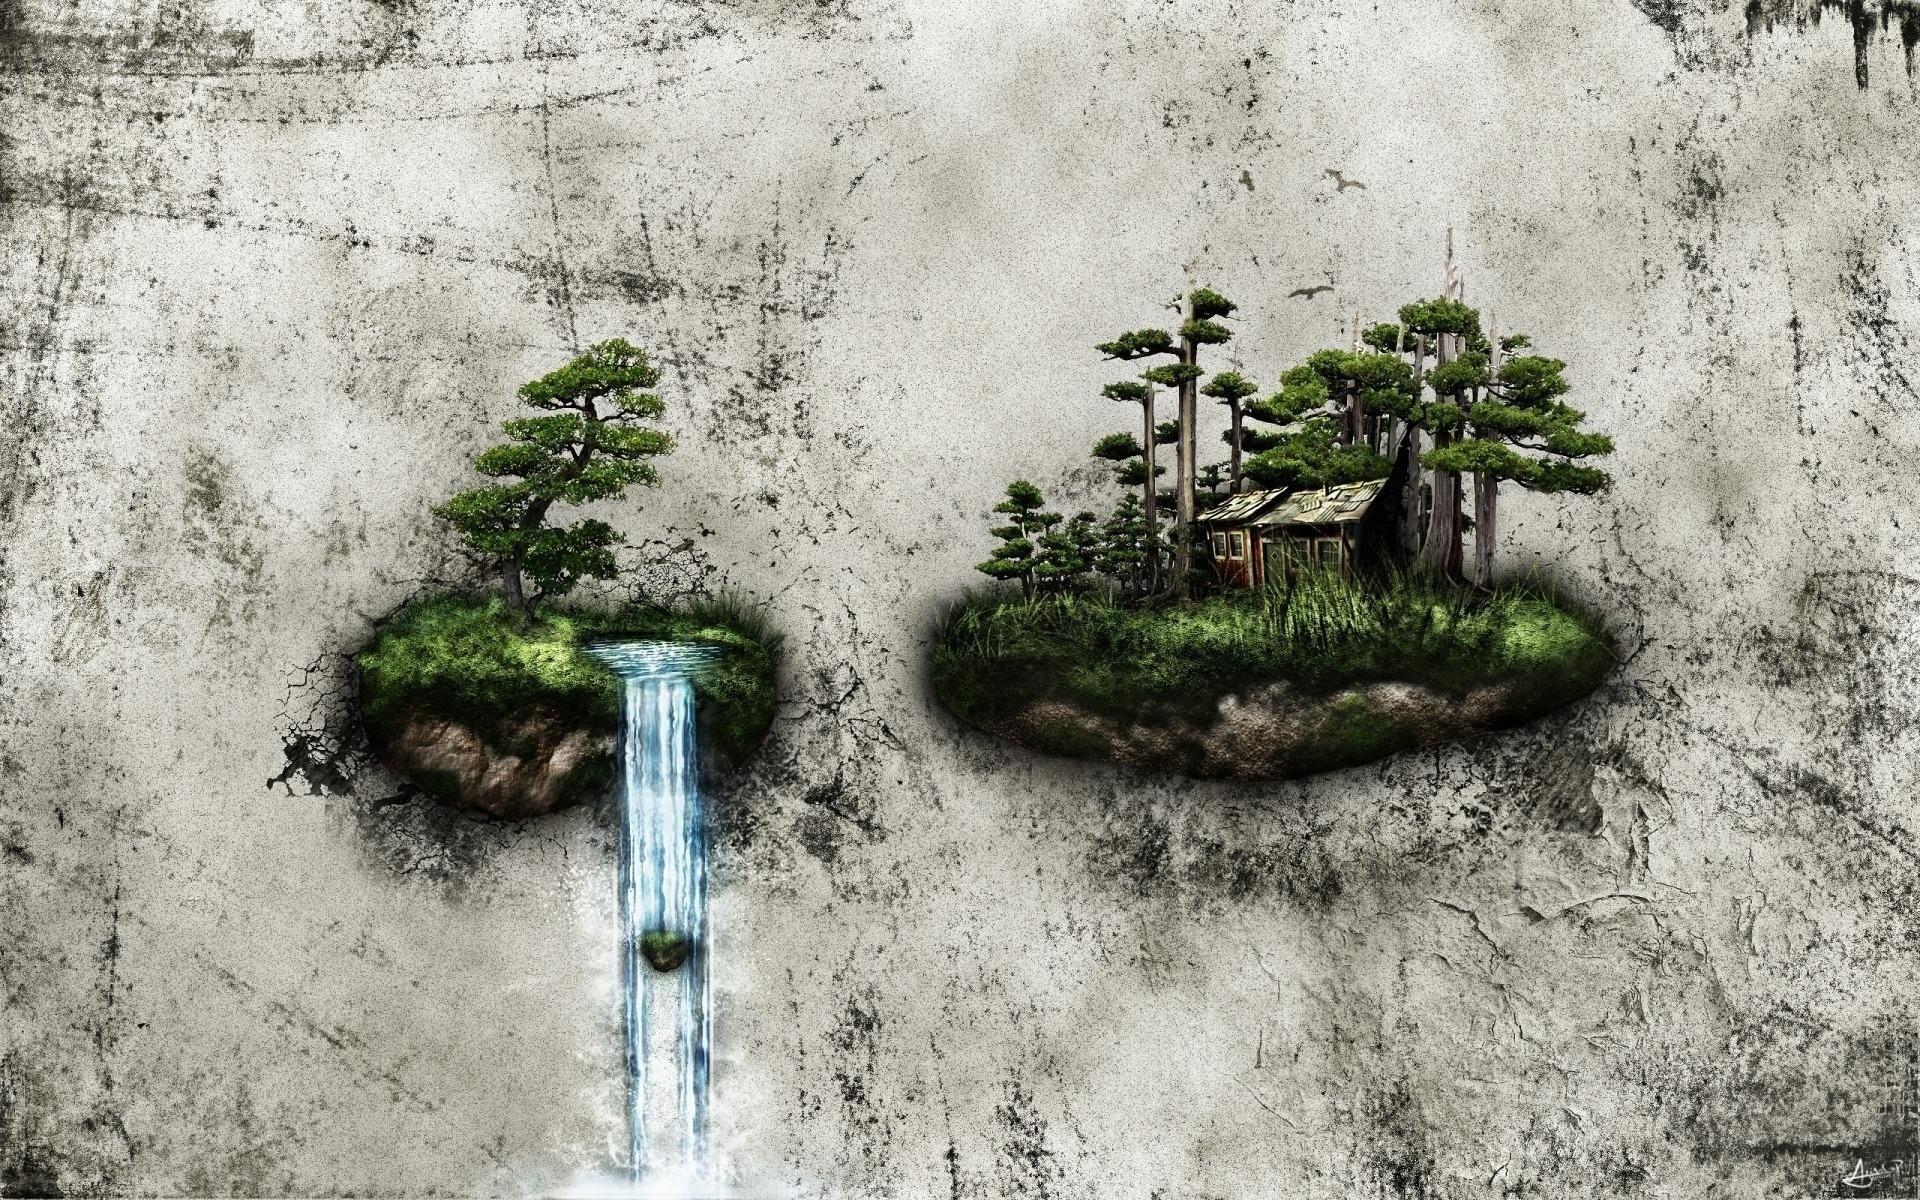 Res: 1920x1200, Bild: Wasserfall Island House Bonsai wallpapers and stock photos. Â«